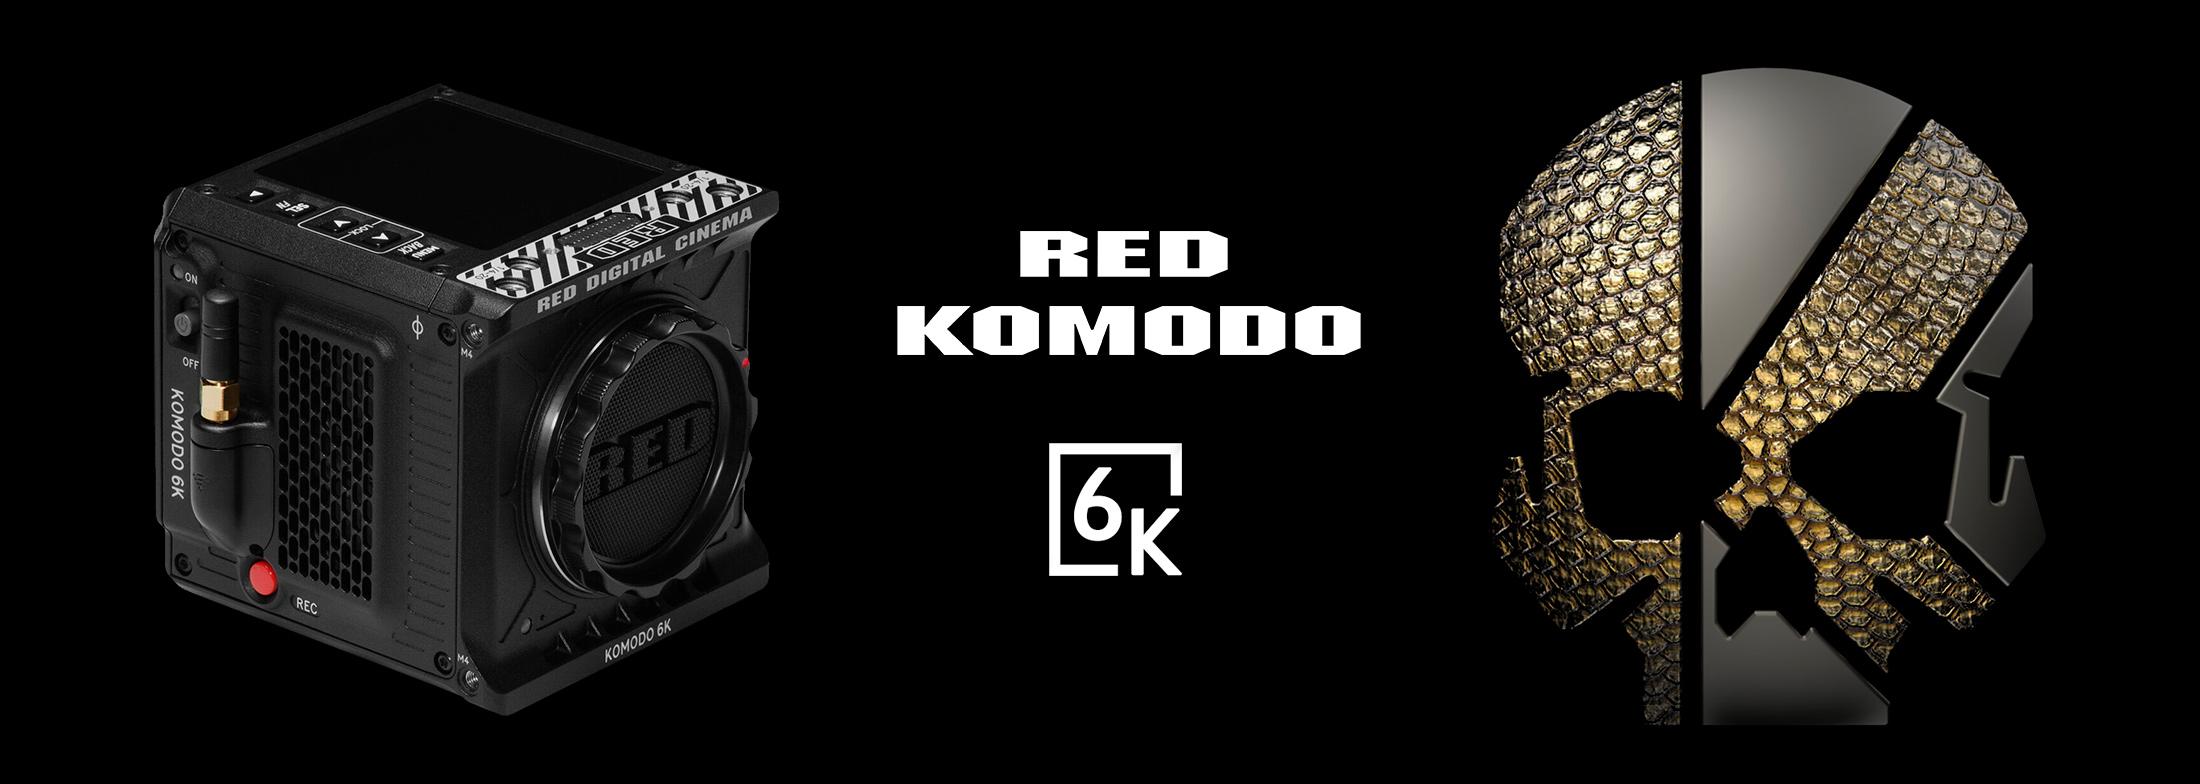 Red Komodo